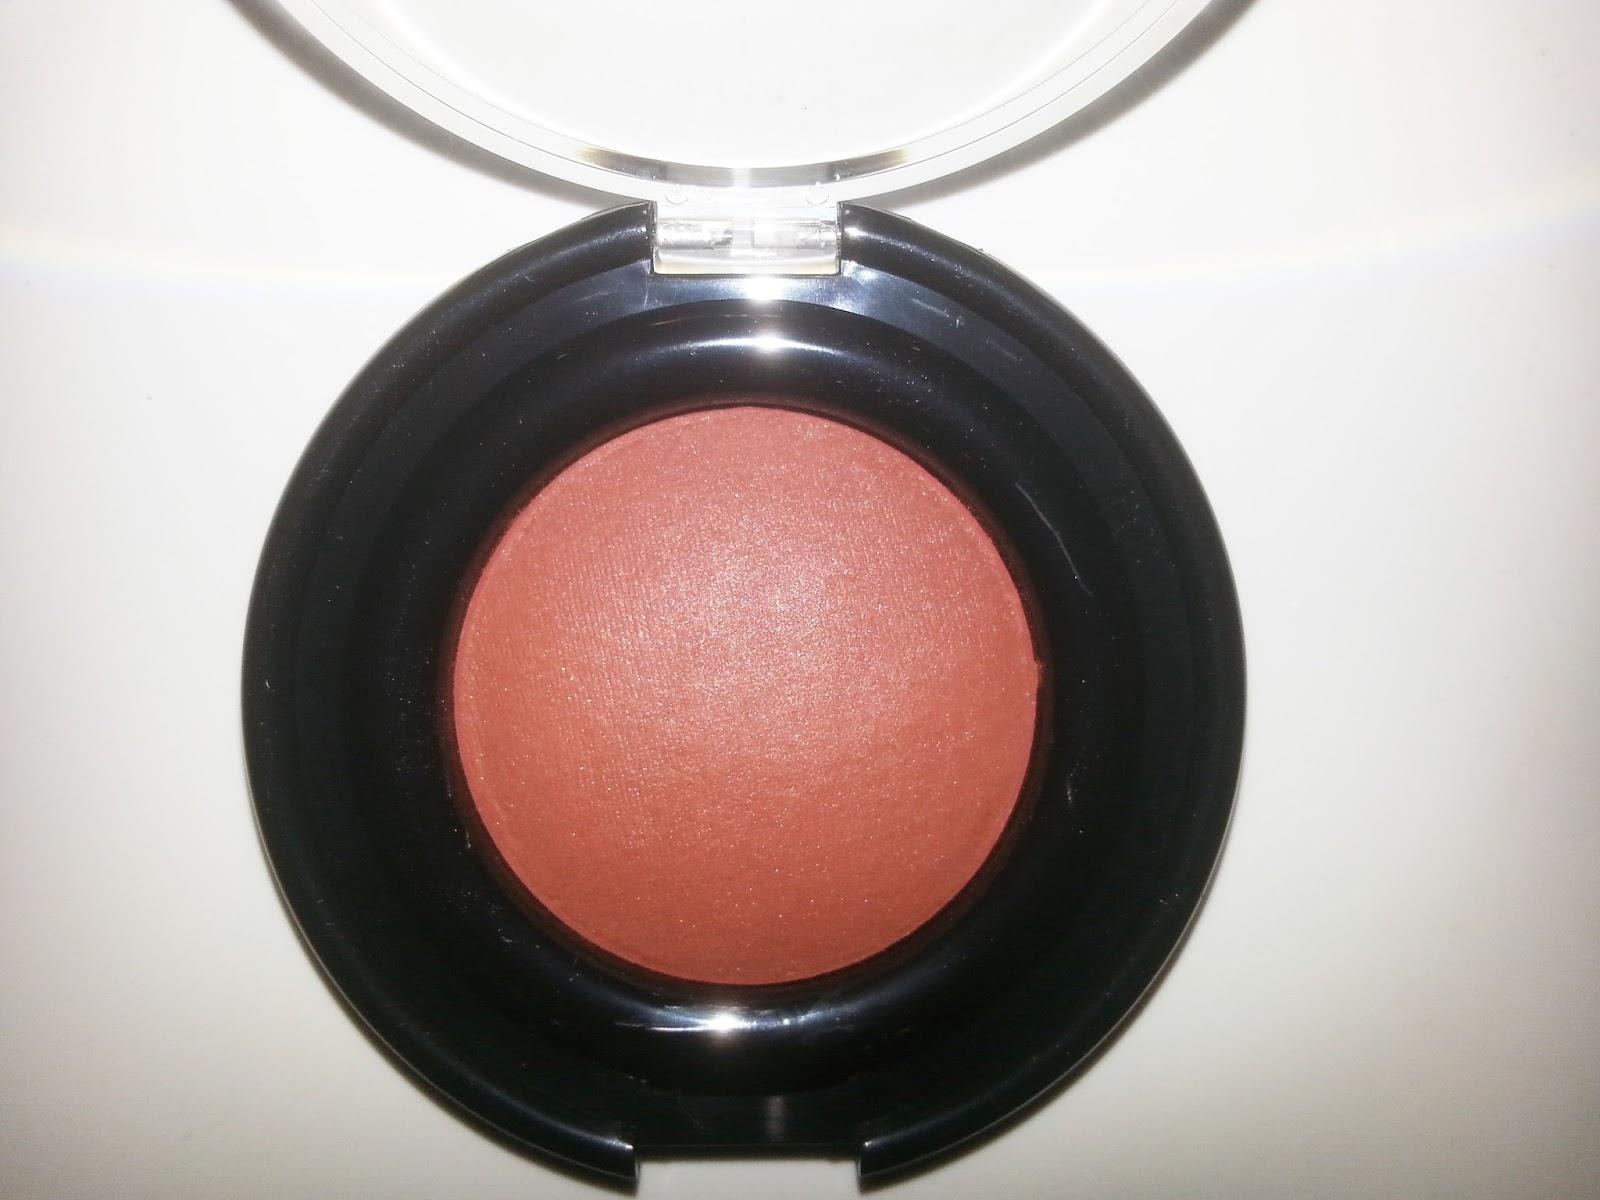 Black Beauty Skin: Blush Artisan Color Baked Blush Black Radiance